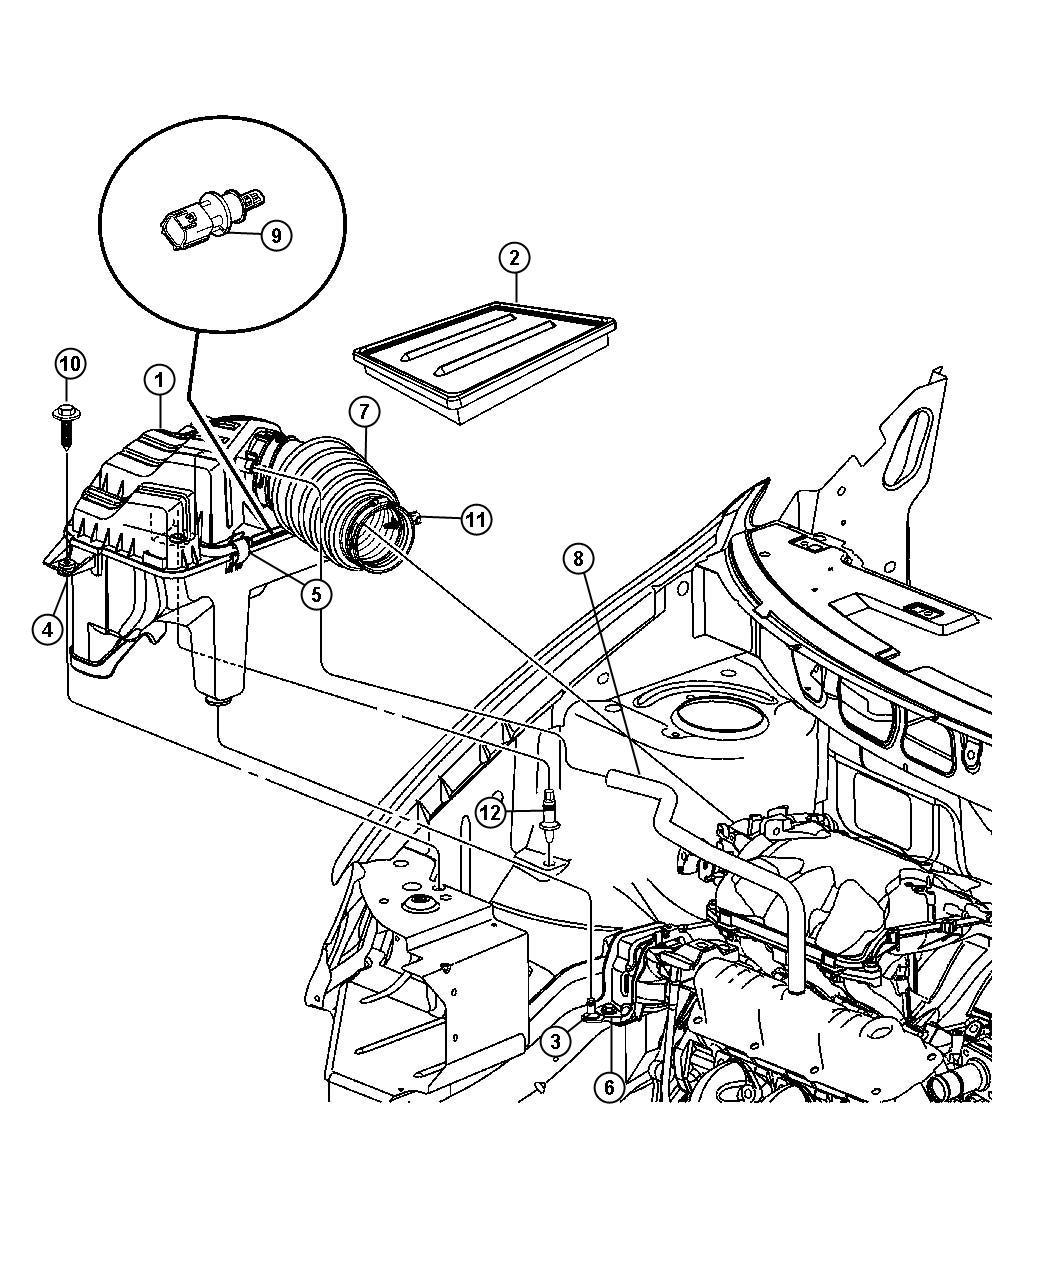 Chrysler Pacifica Hose. Pcv valve to intake manifold